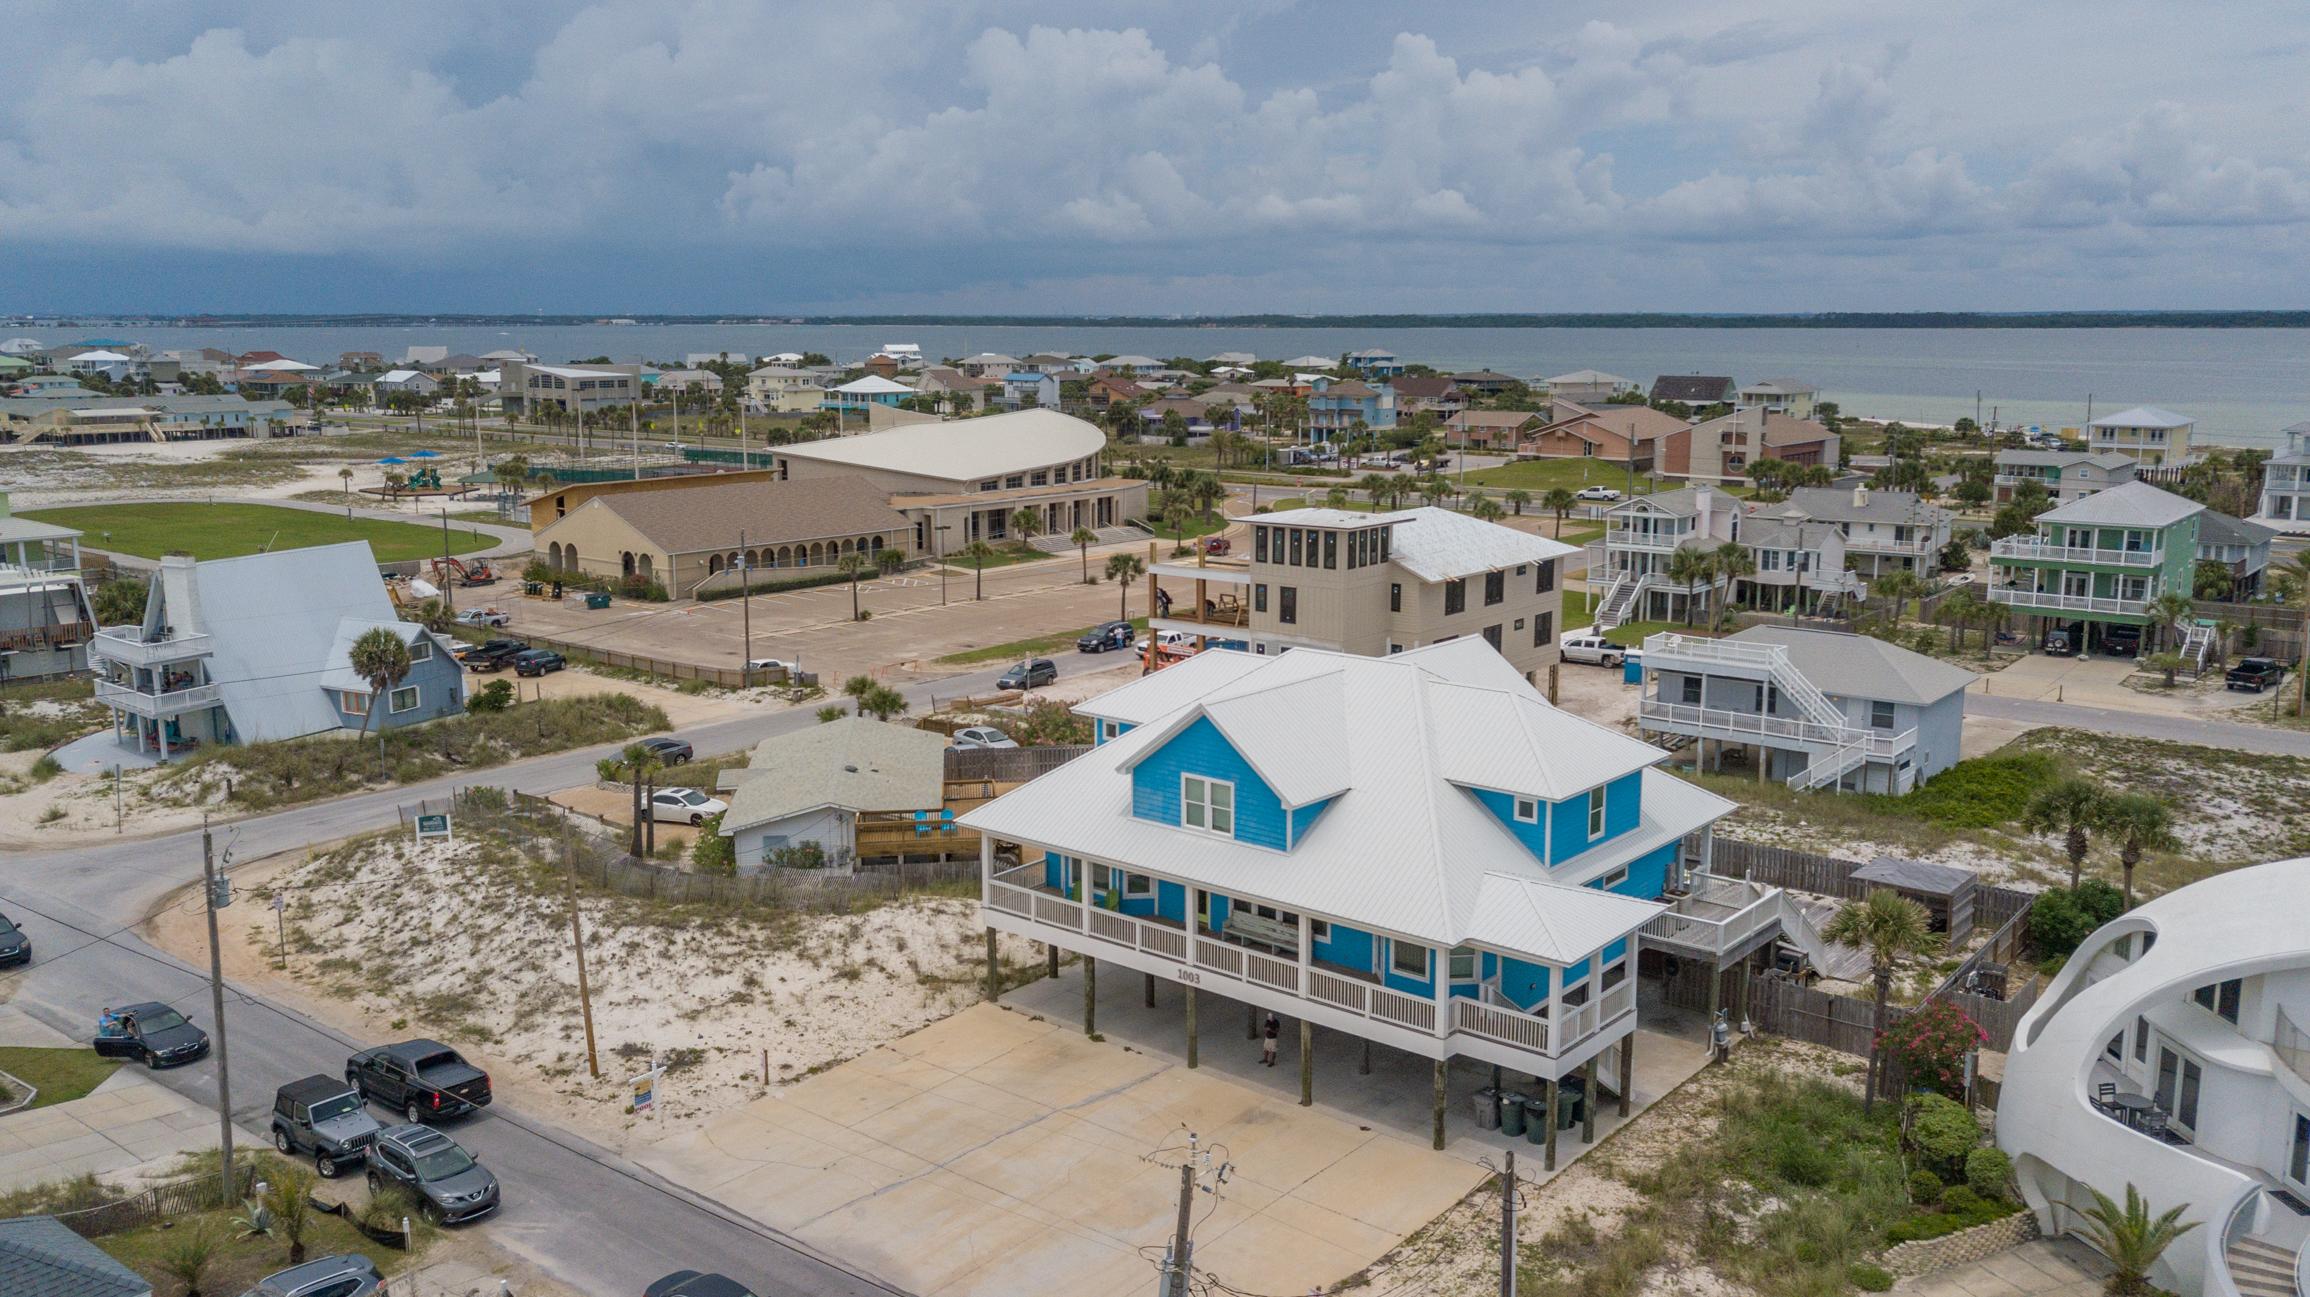 Ariola 1003 - The Starfish House House/Cottage rental in Pensacola Beach House Rentals in Pensacola Beach Florida - #68